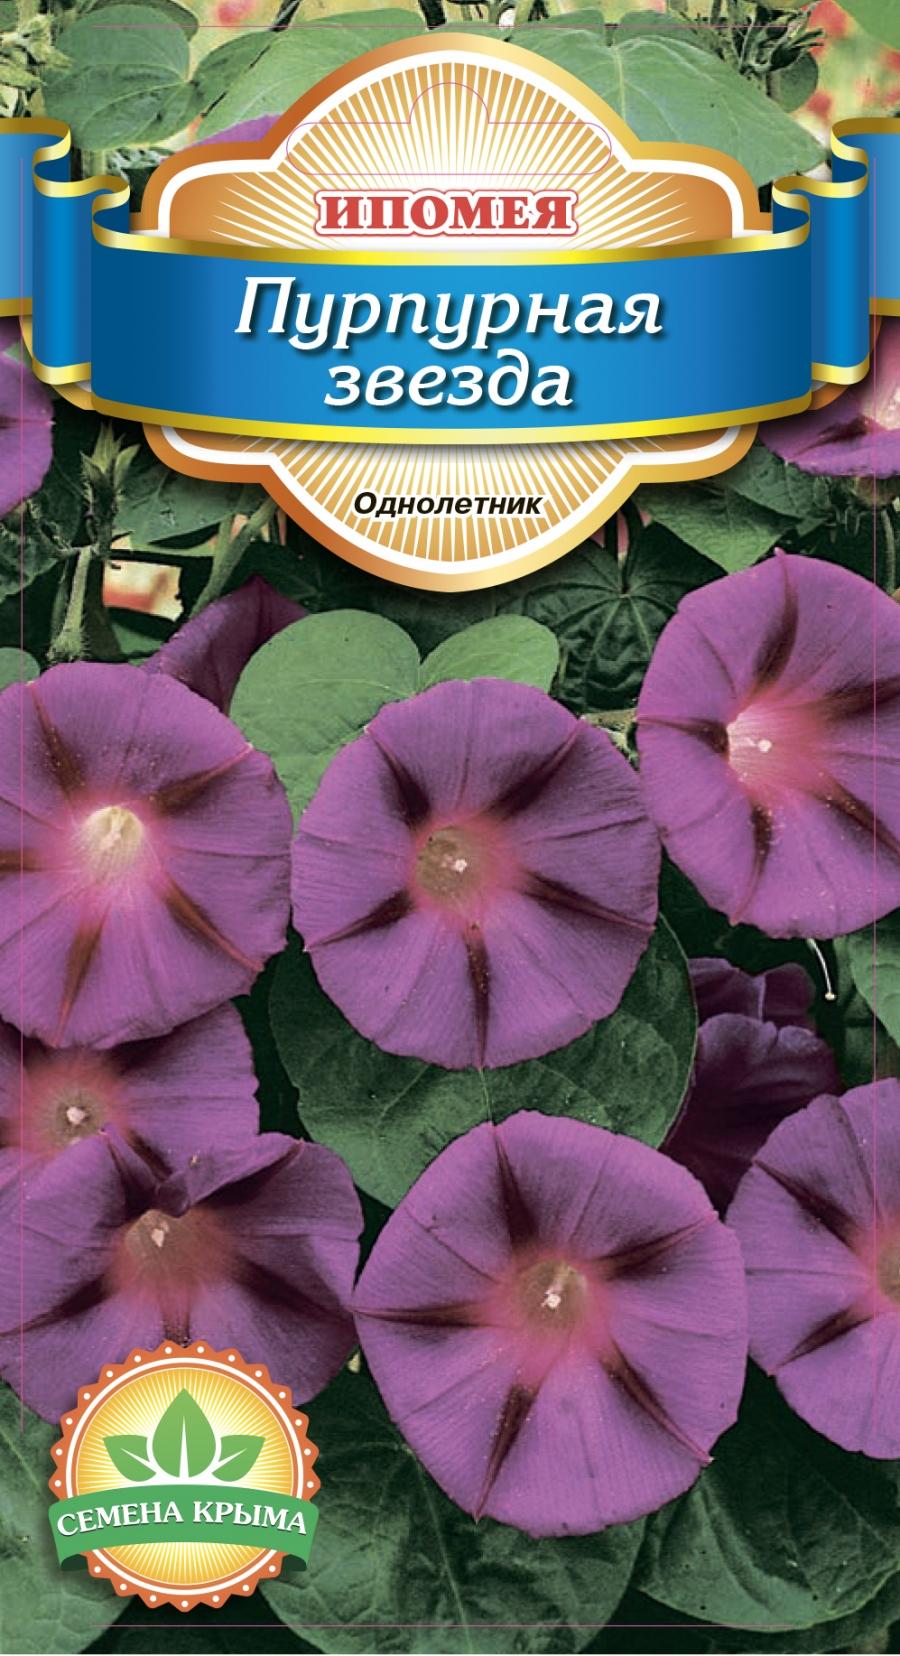 Цветок ипомея пурпурная райские звезды фото